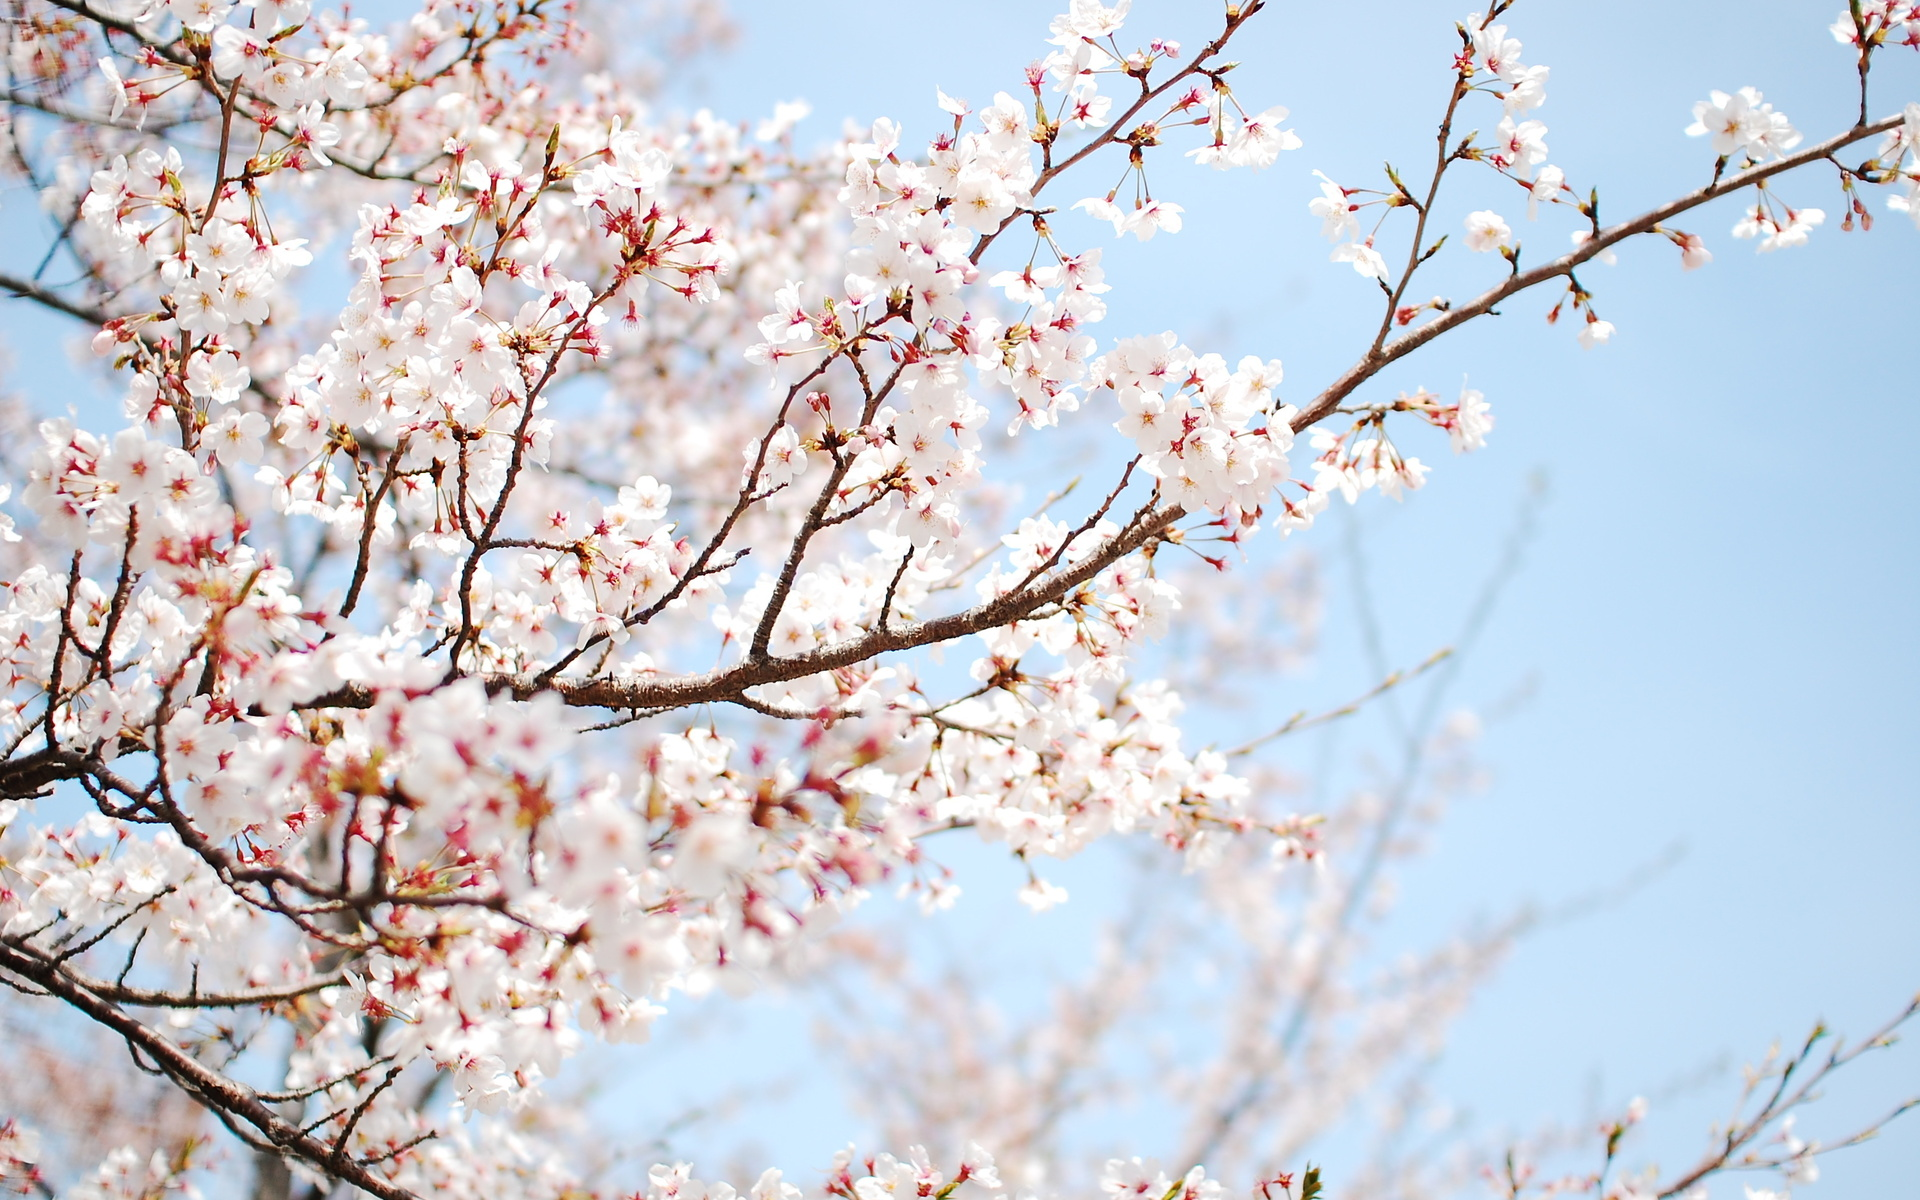 Get Cherry Blossom Tree Background Hd Pics